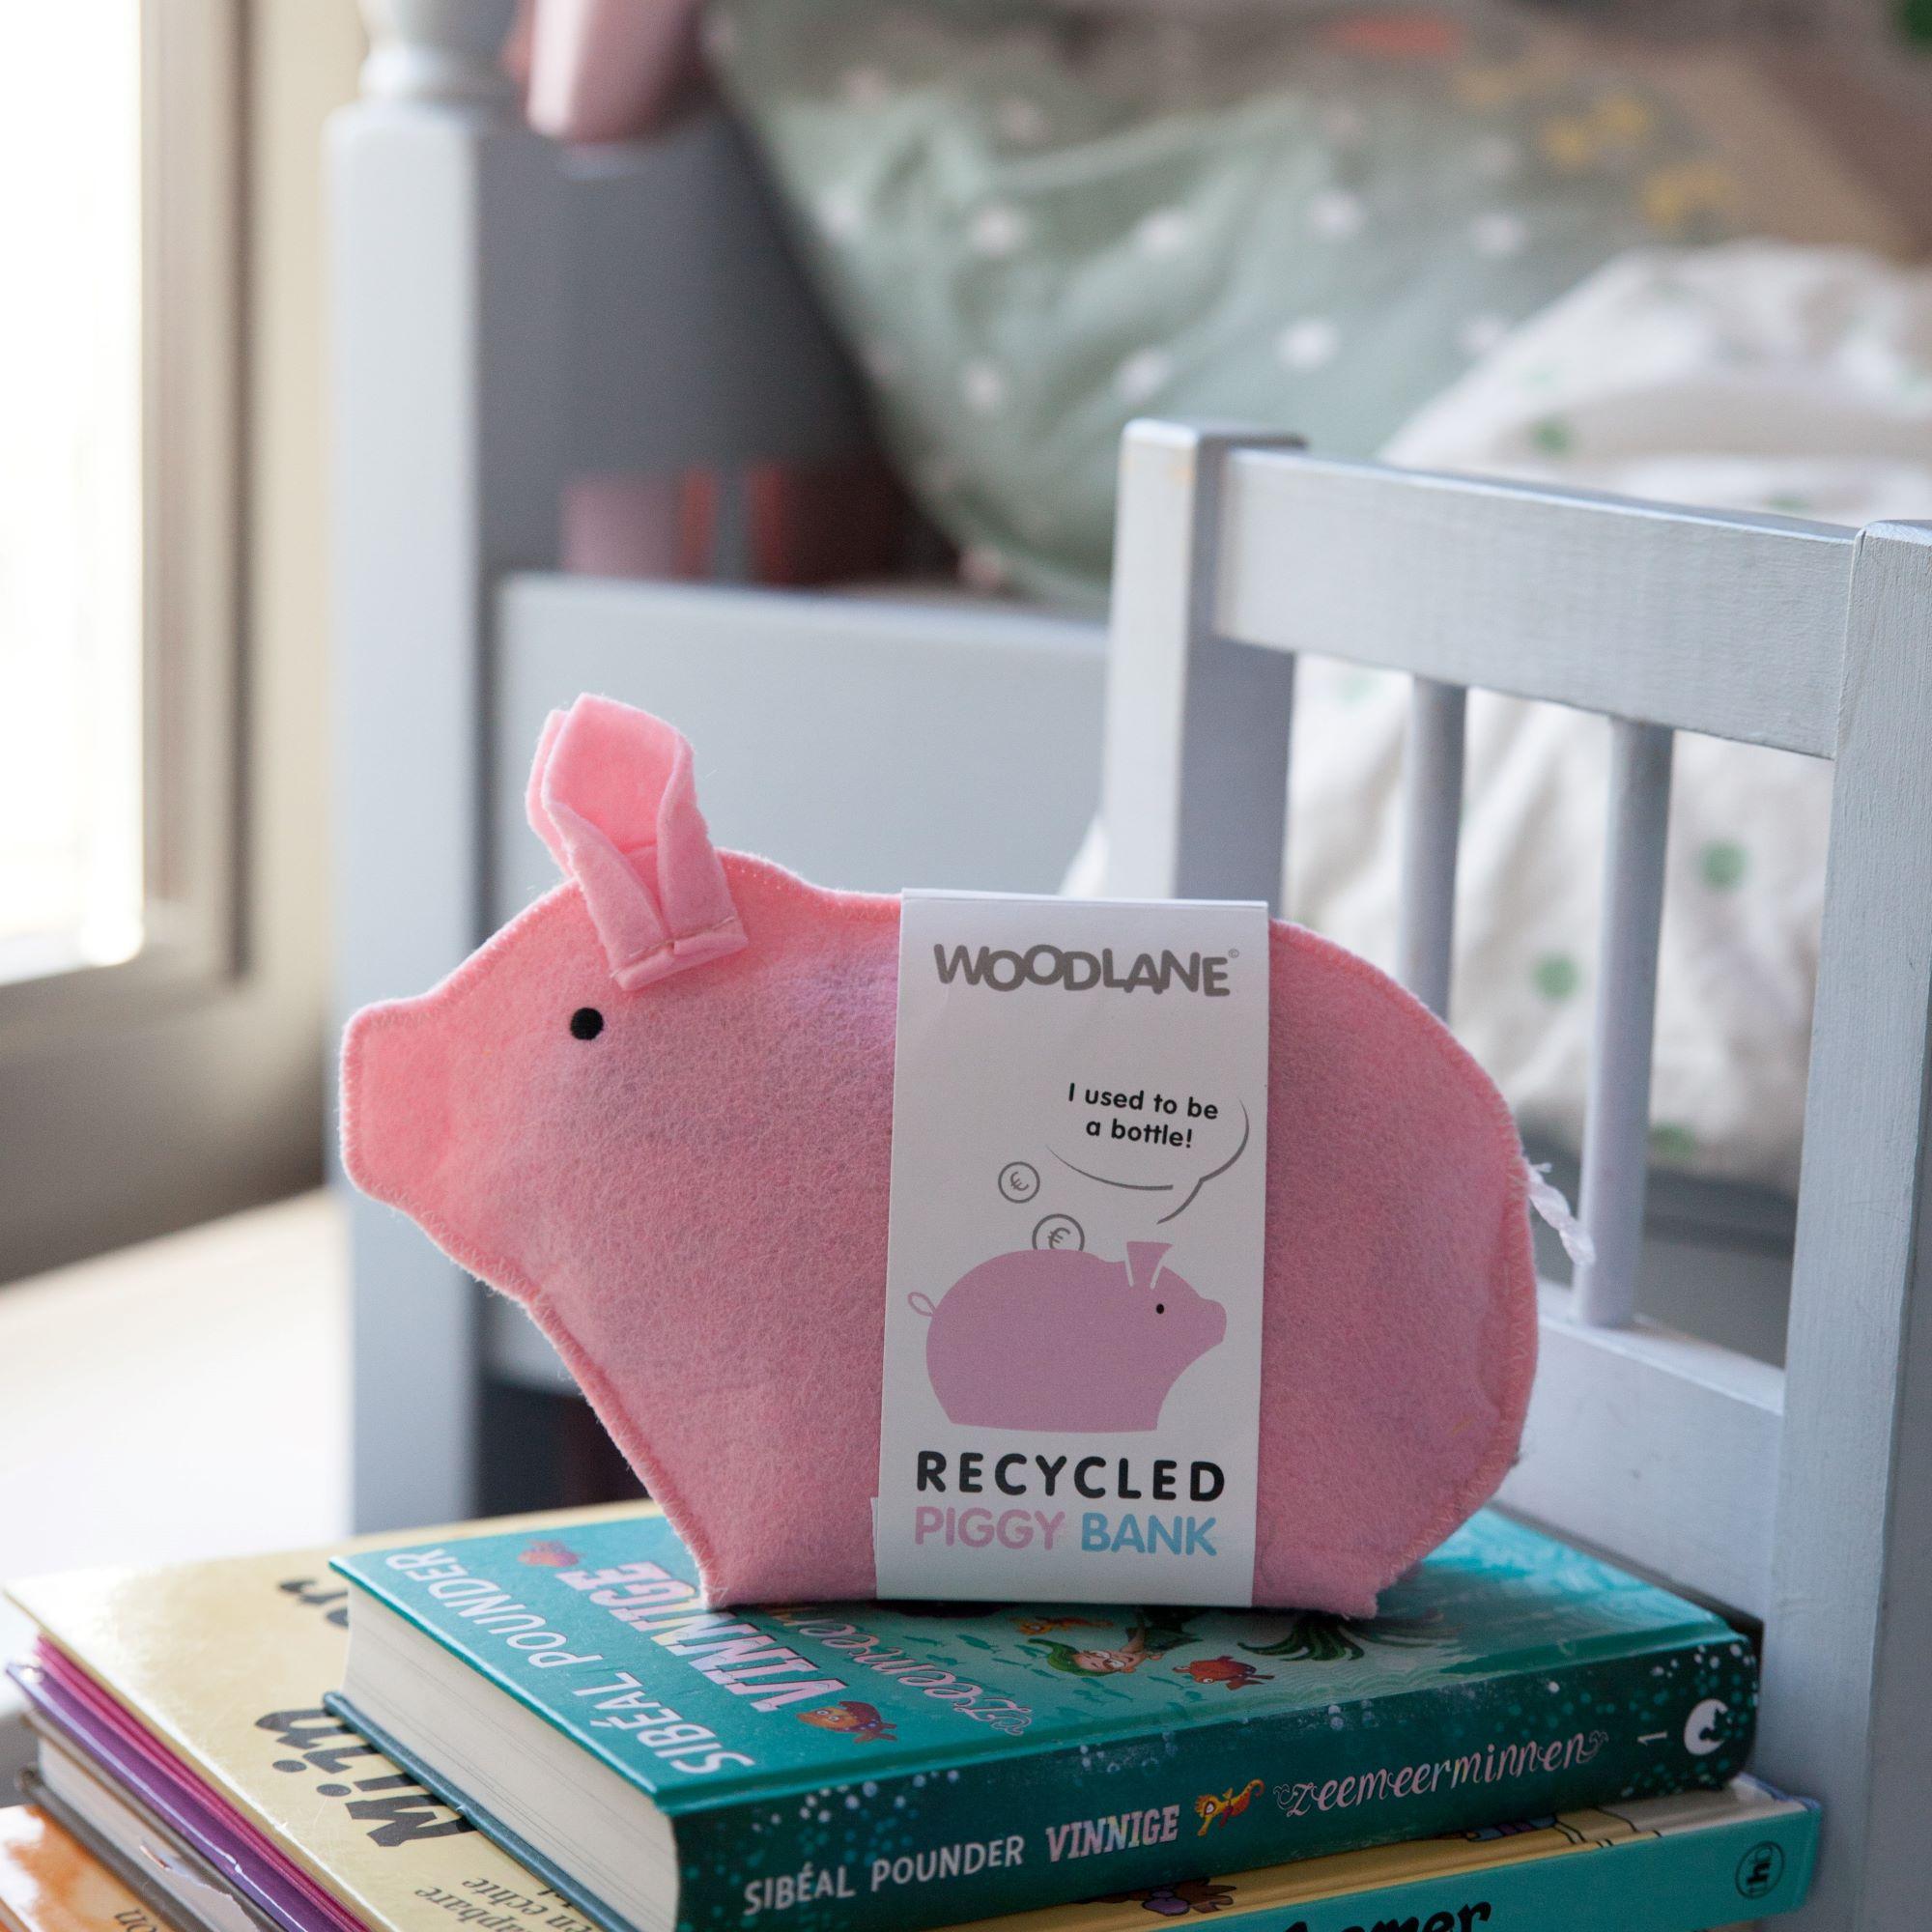 Woodlane Piggy-Frederique van Gemert-8748